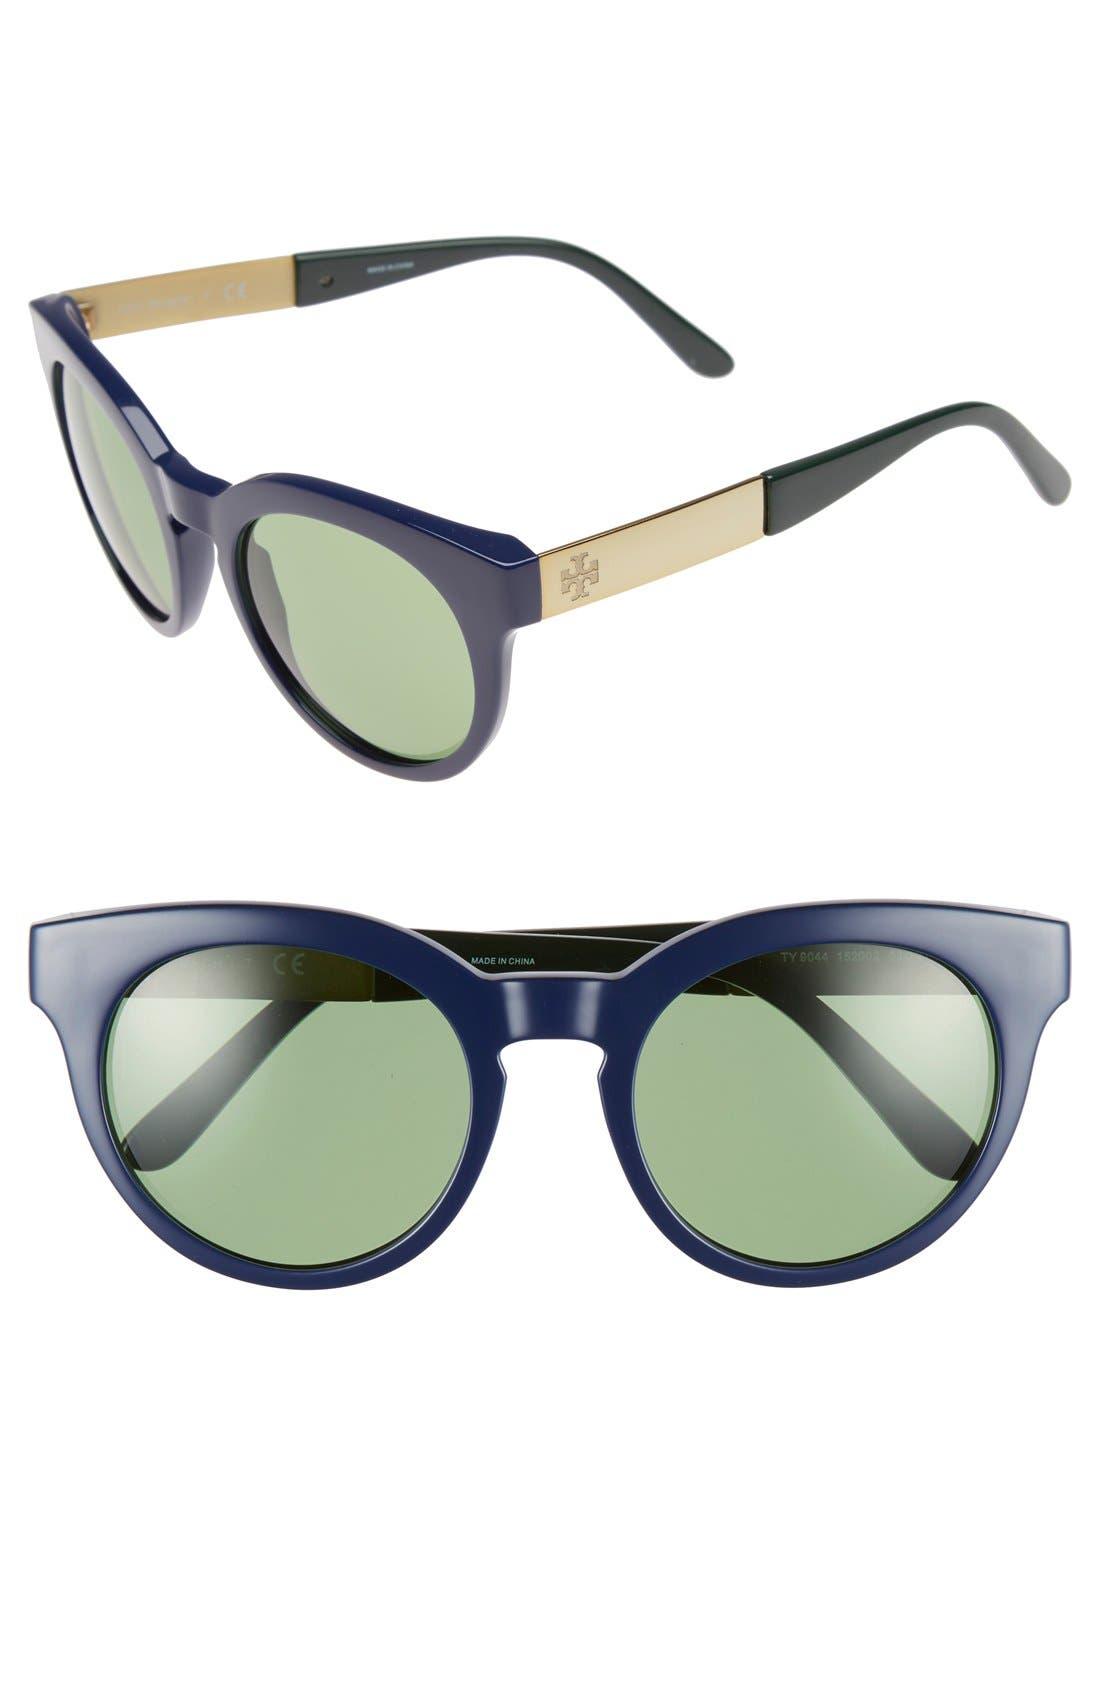 Alternate Image 1 Selected - Tory Burch 52mm Retro Sunglasses